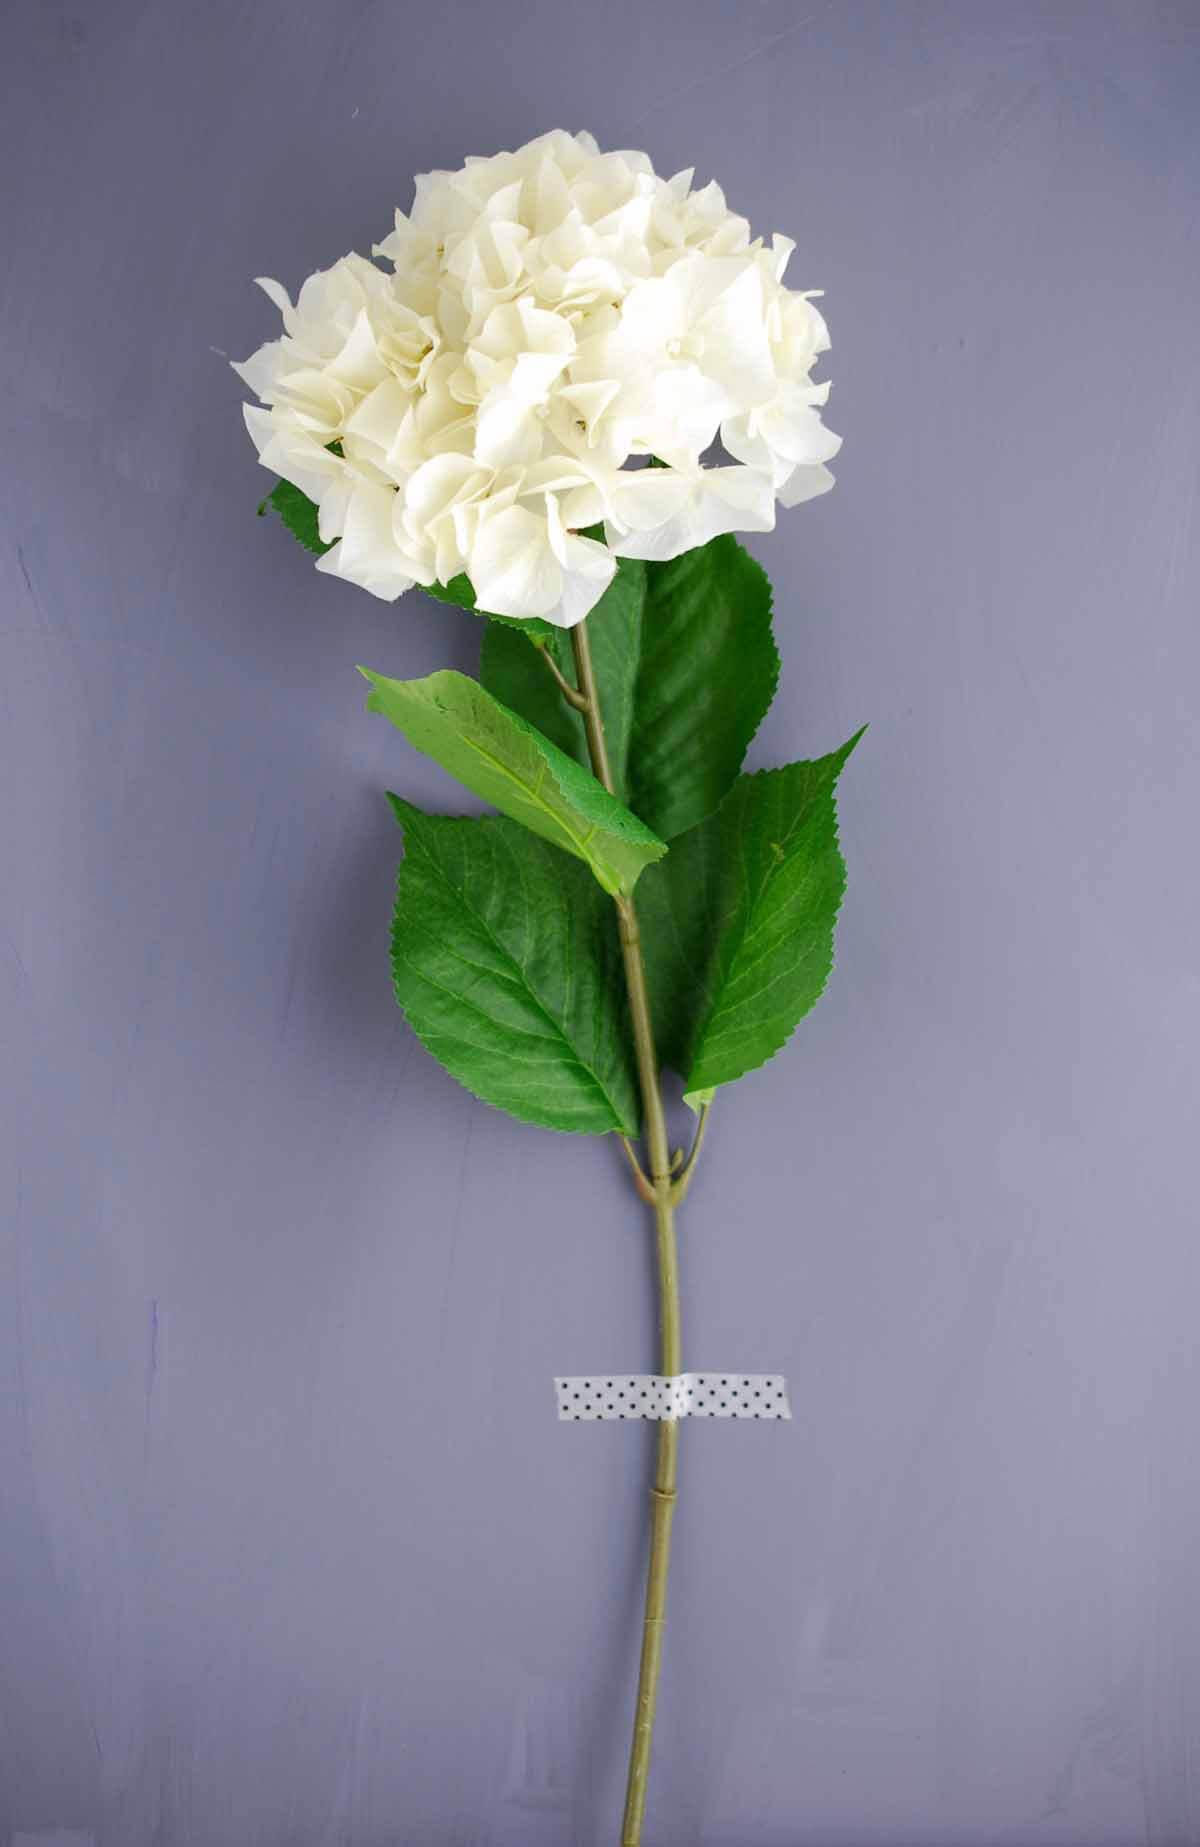 Artificial Ivory White Hydrangea Flowers 7in Bloom